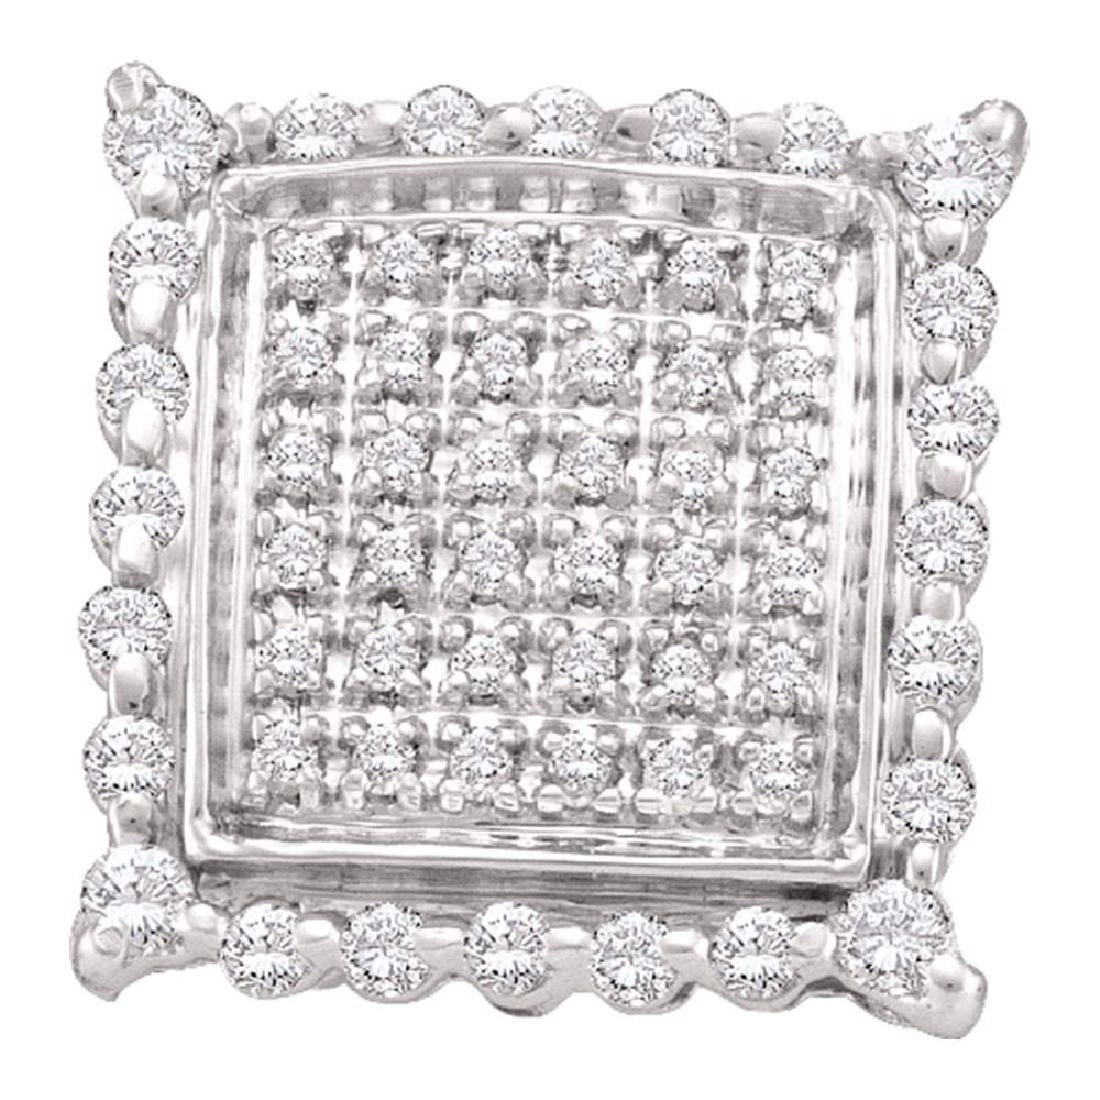 0.50 CTW Diamond Square Cluster Stud Earrings 10KT